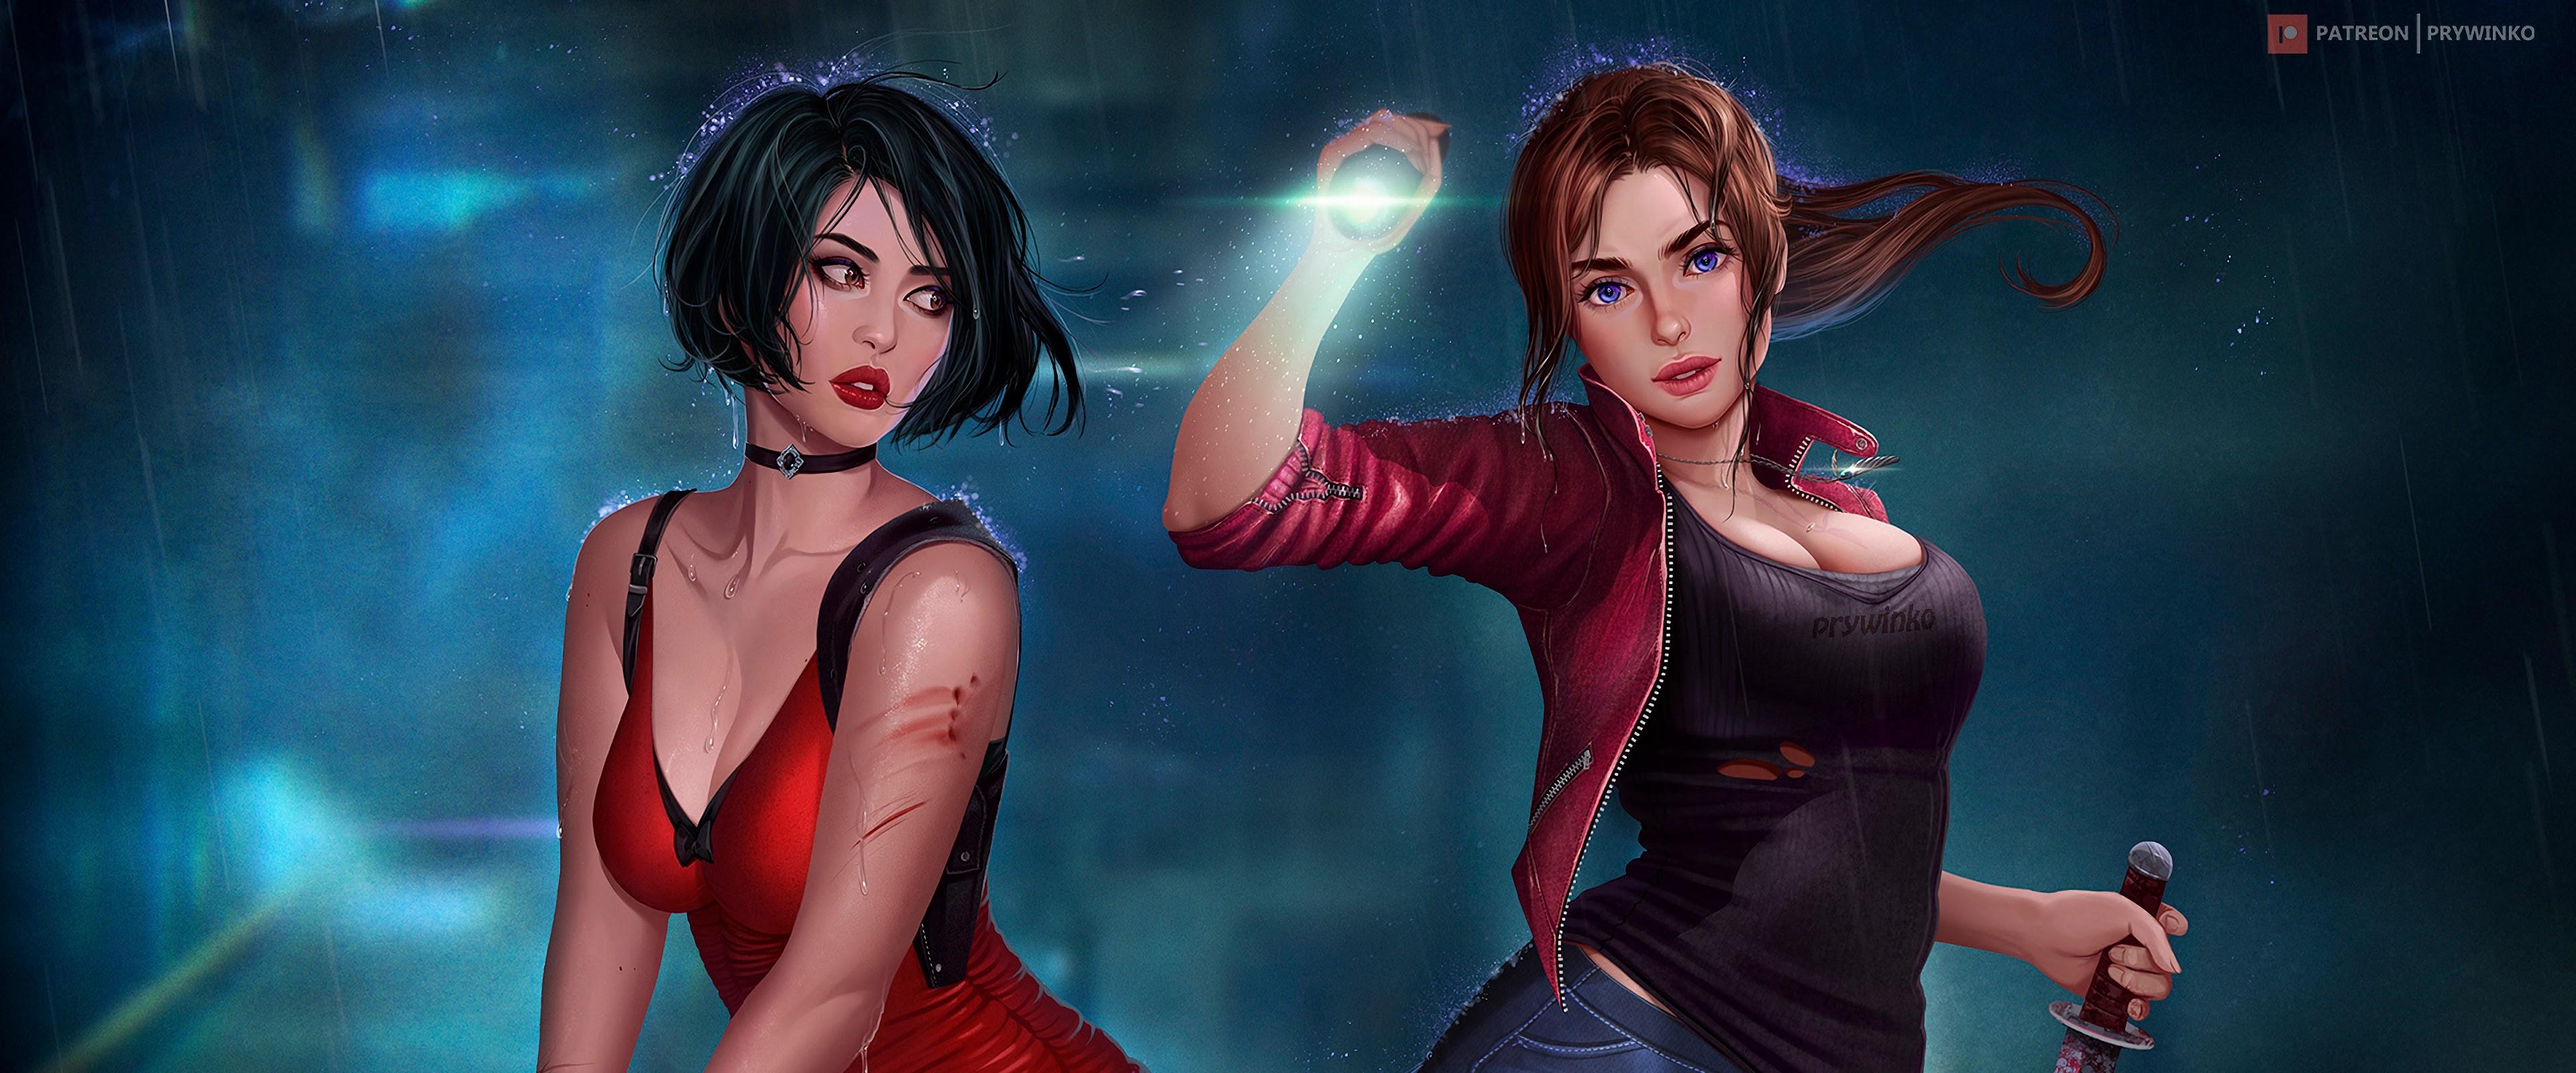 Ada Wong Claire Redfield Resident Evil 2 Girls 4K Wallpaper #19